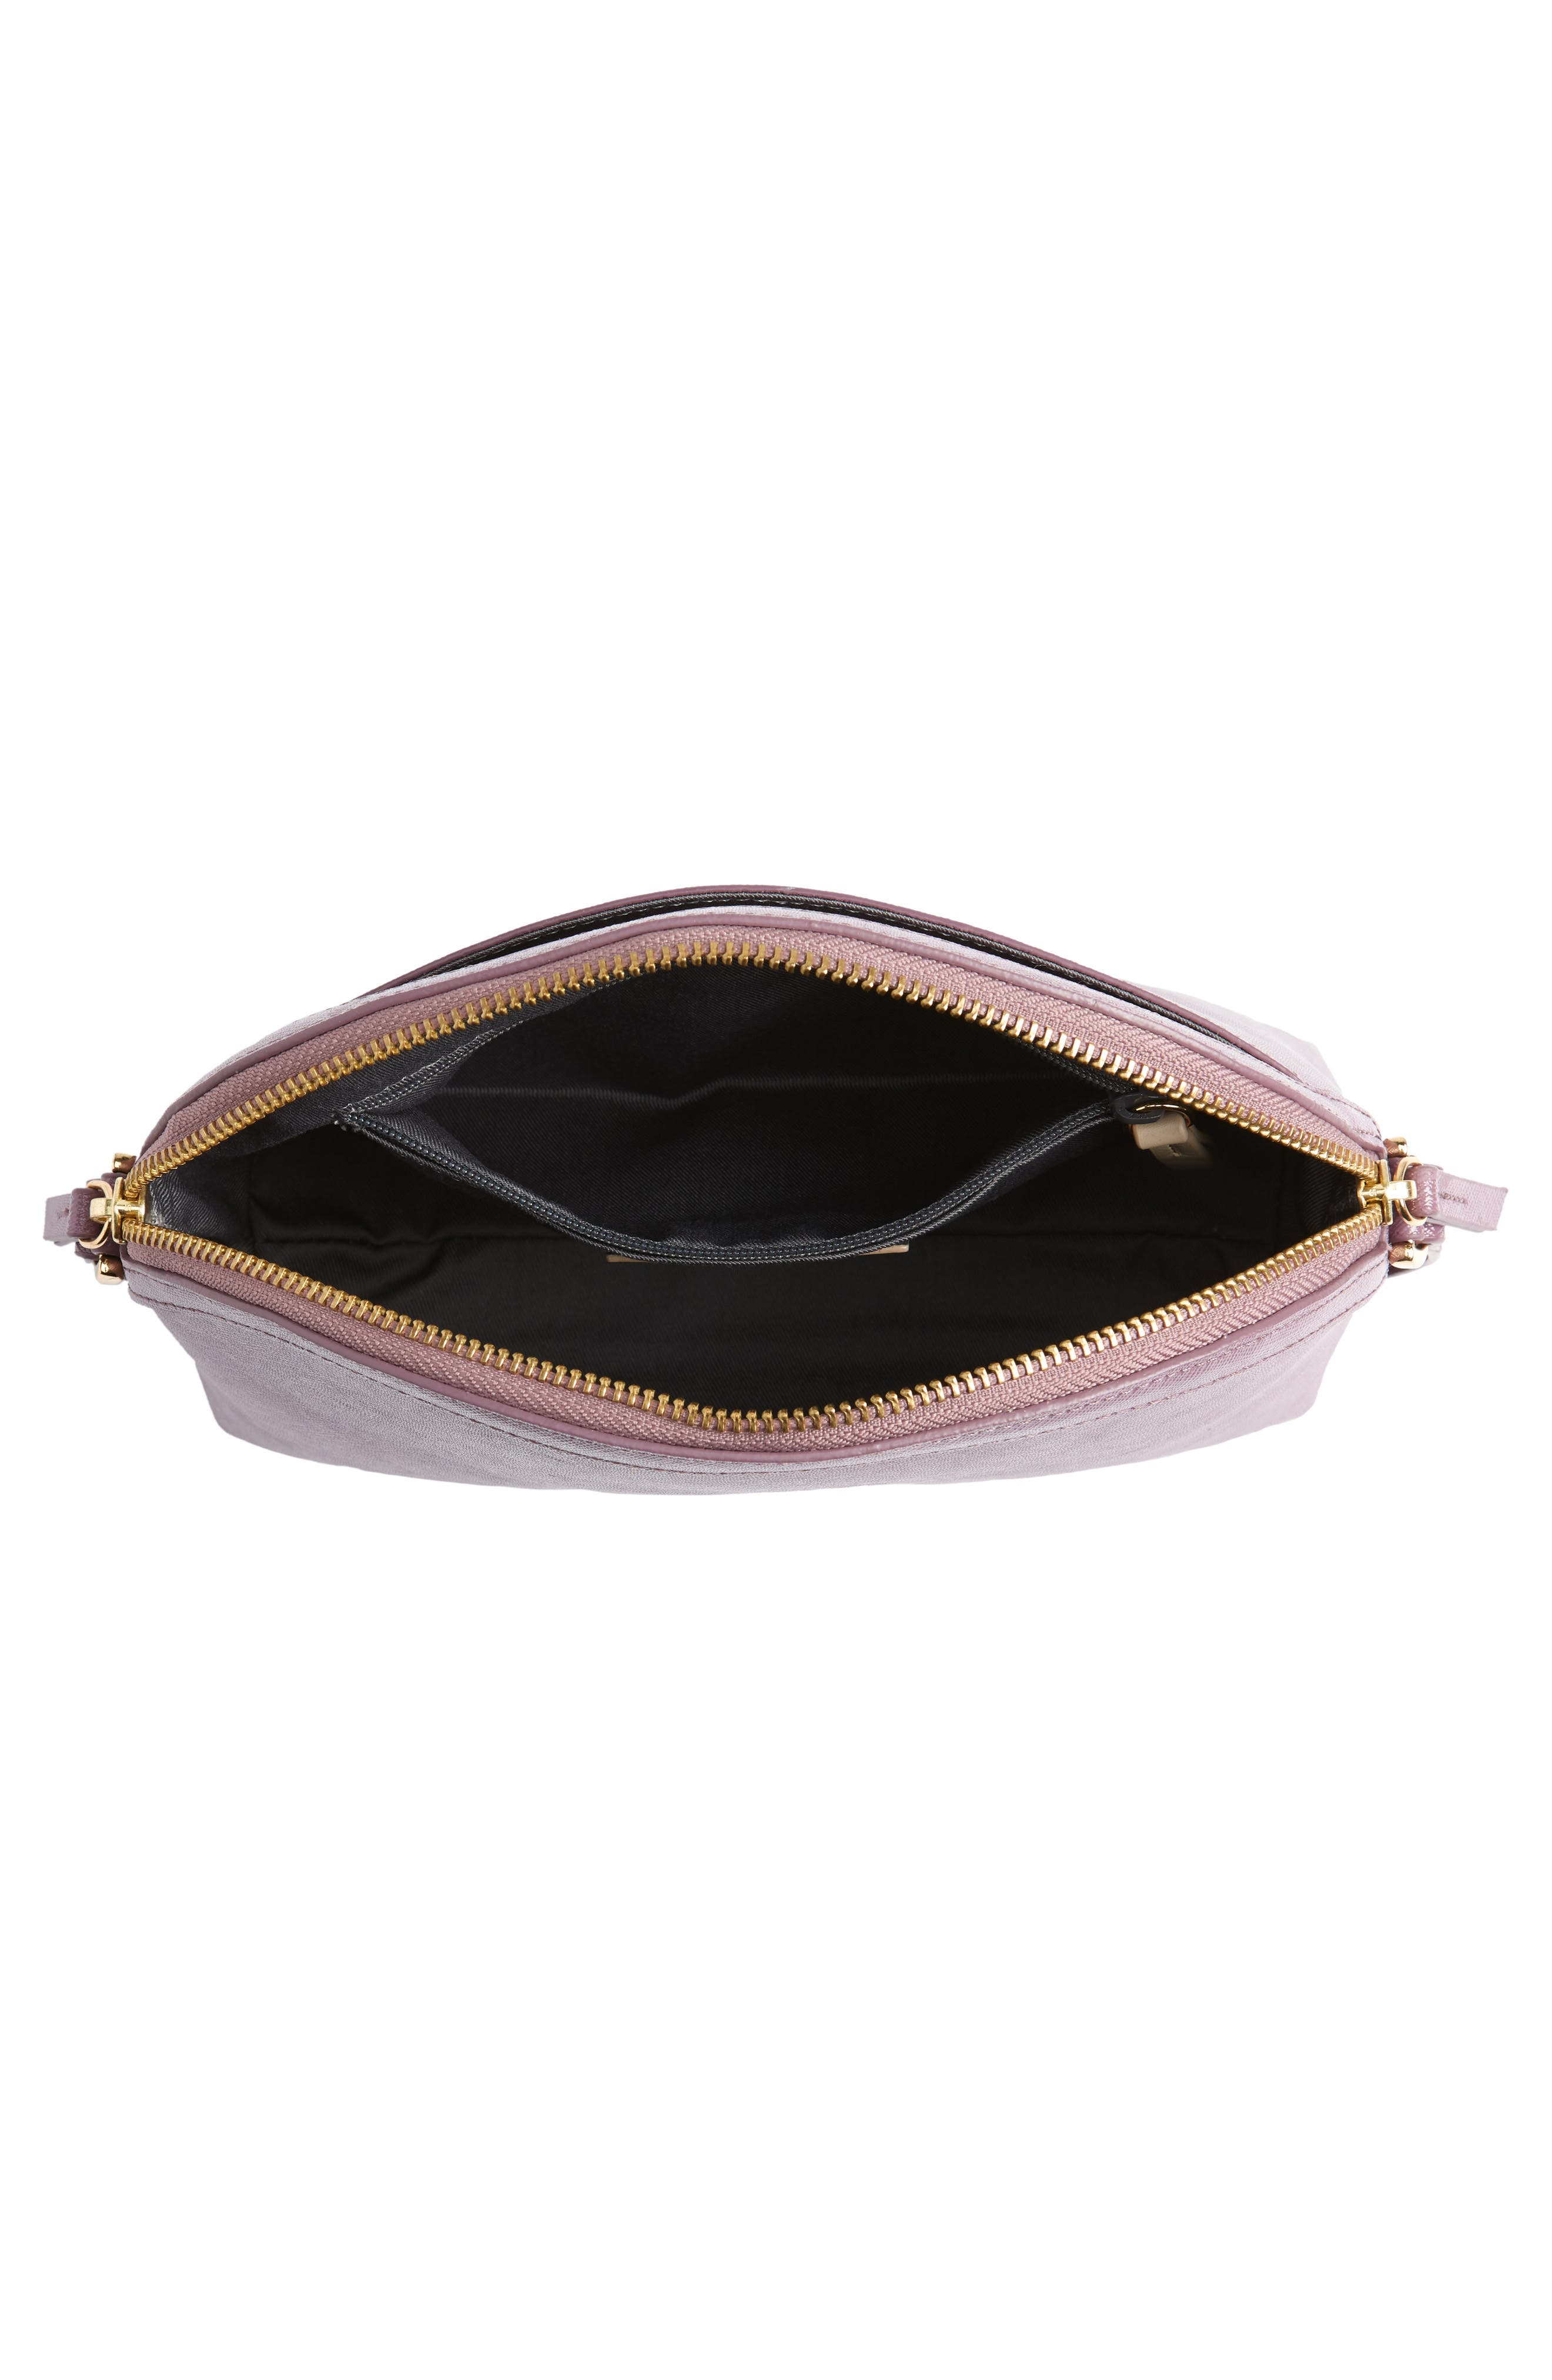 Isobel Half Moon Leather Crossbody Bag,                             Alternate thumbnail 4, color,                             PURPLE BETTA